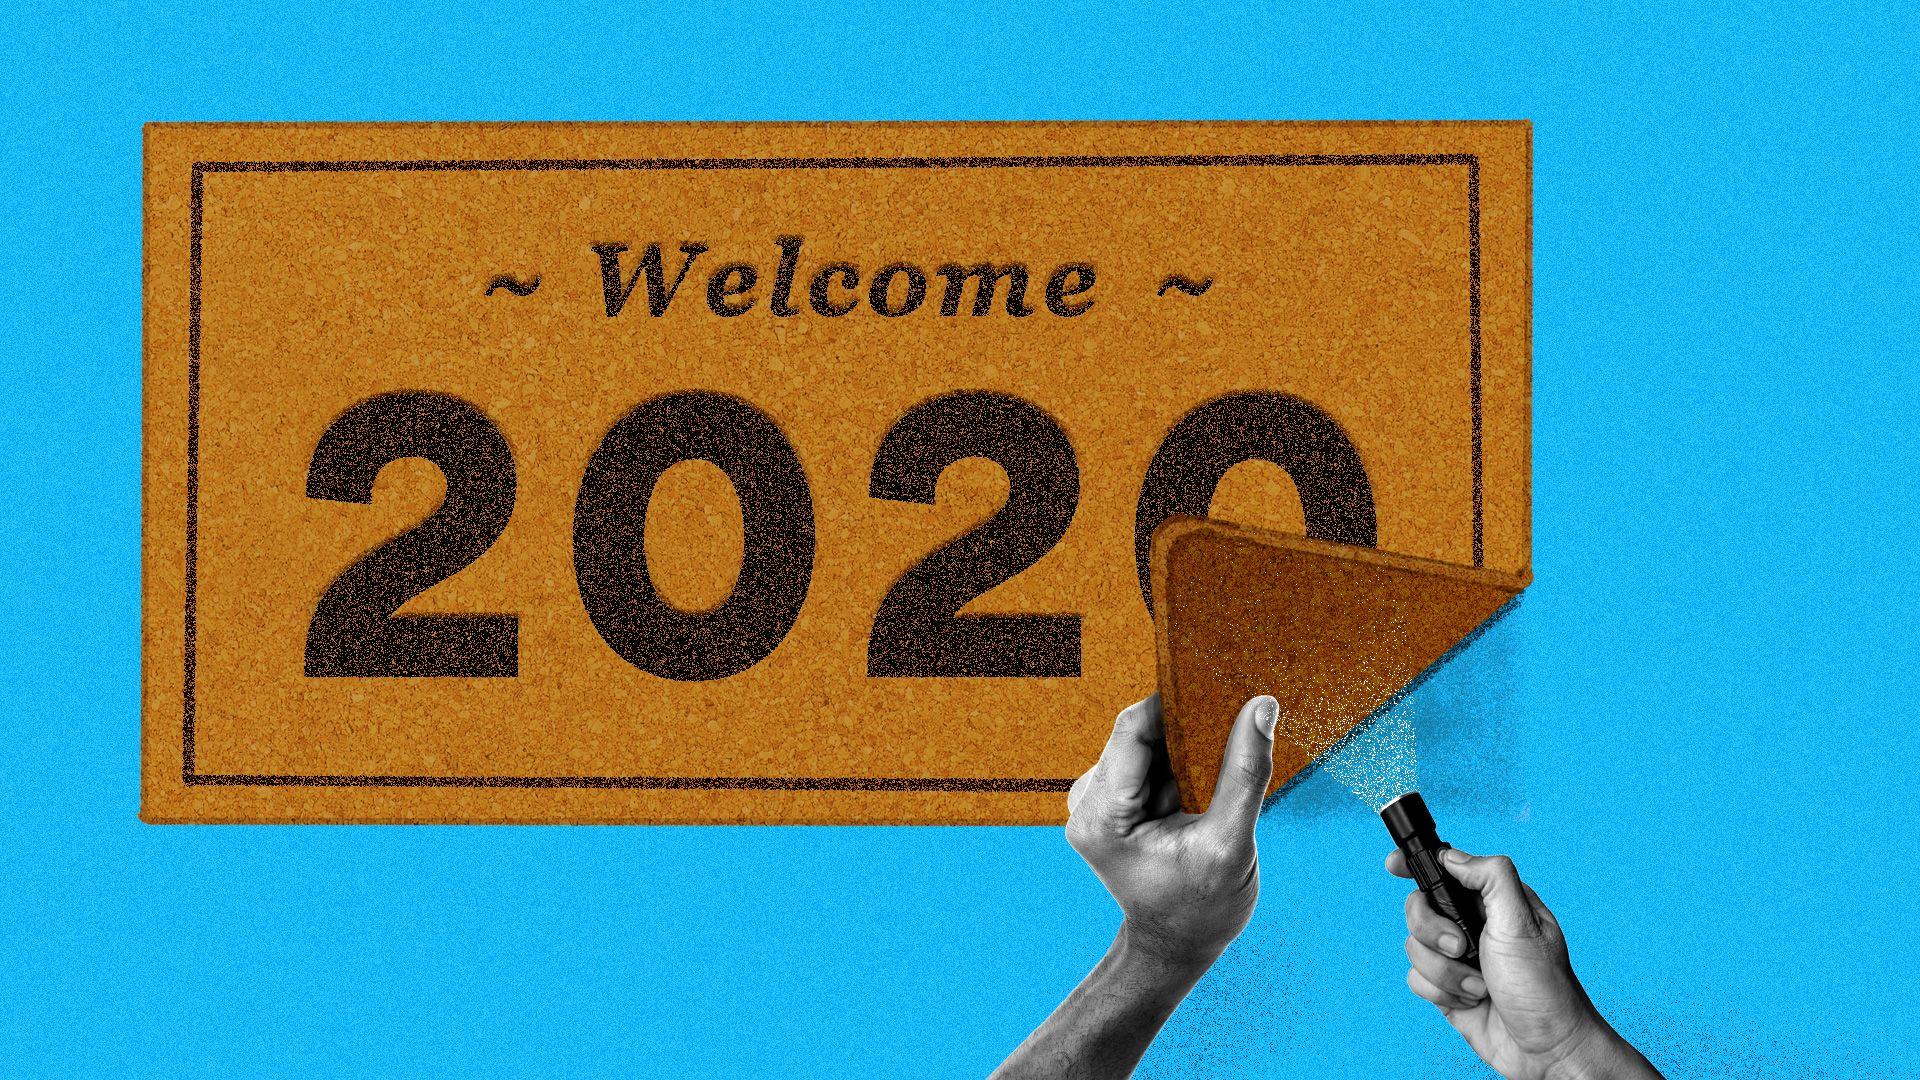 A pair of hands peeking under a 2020 welcome rug